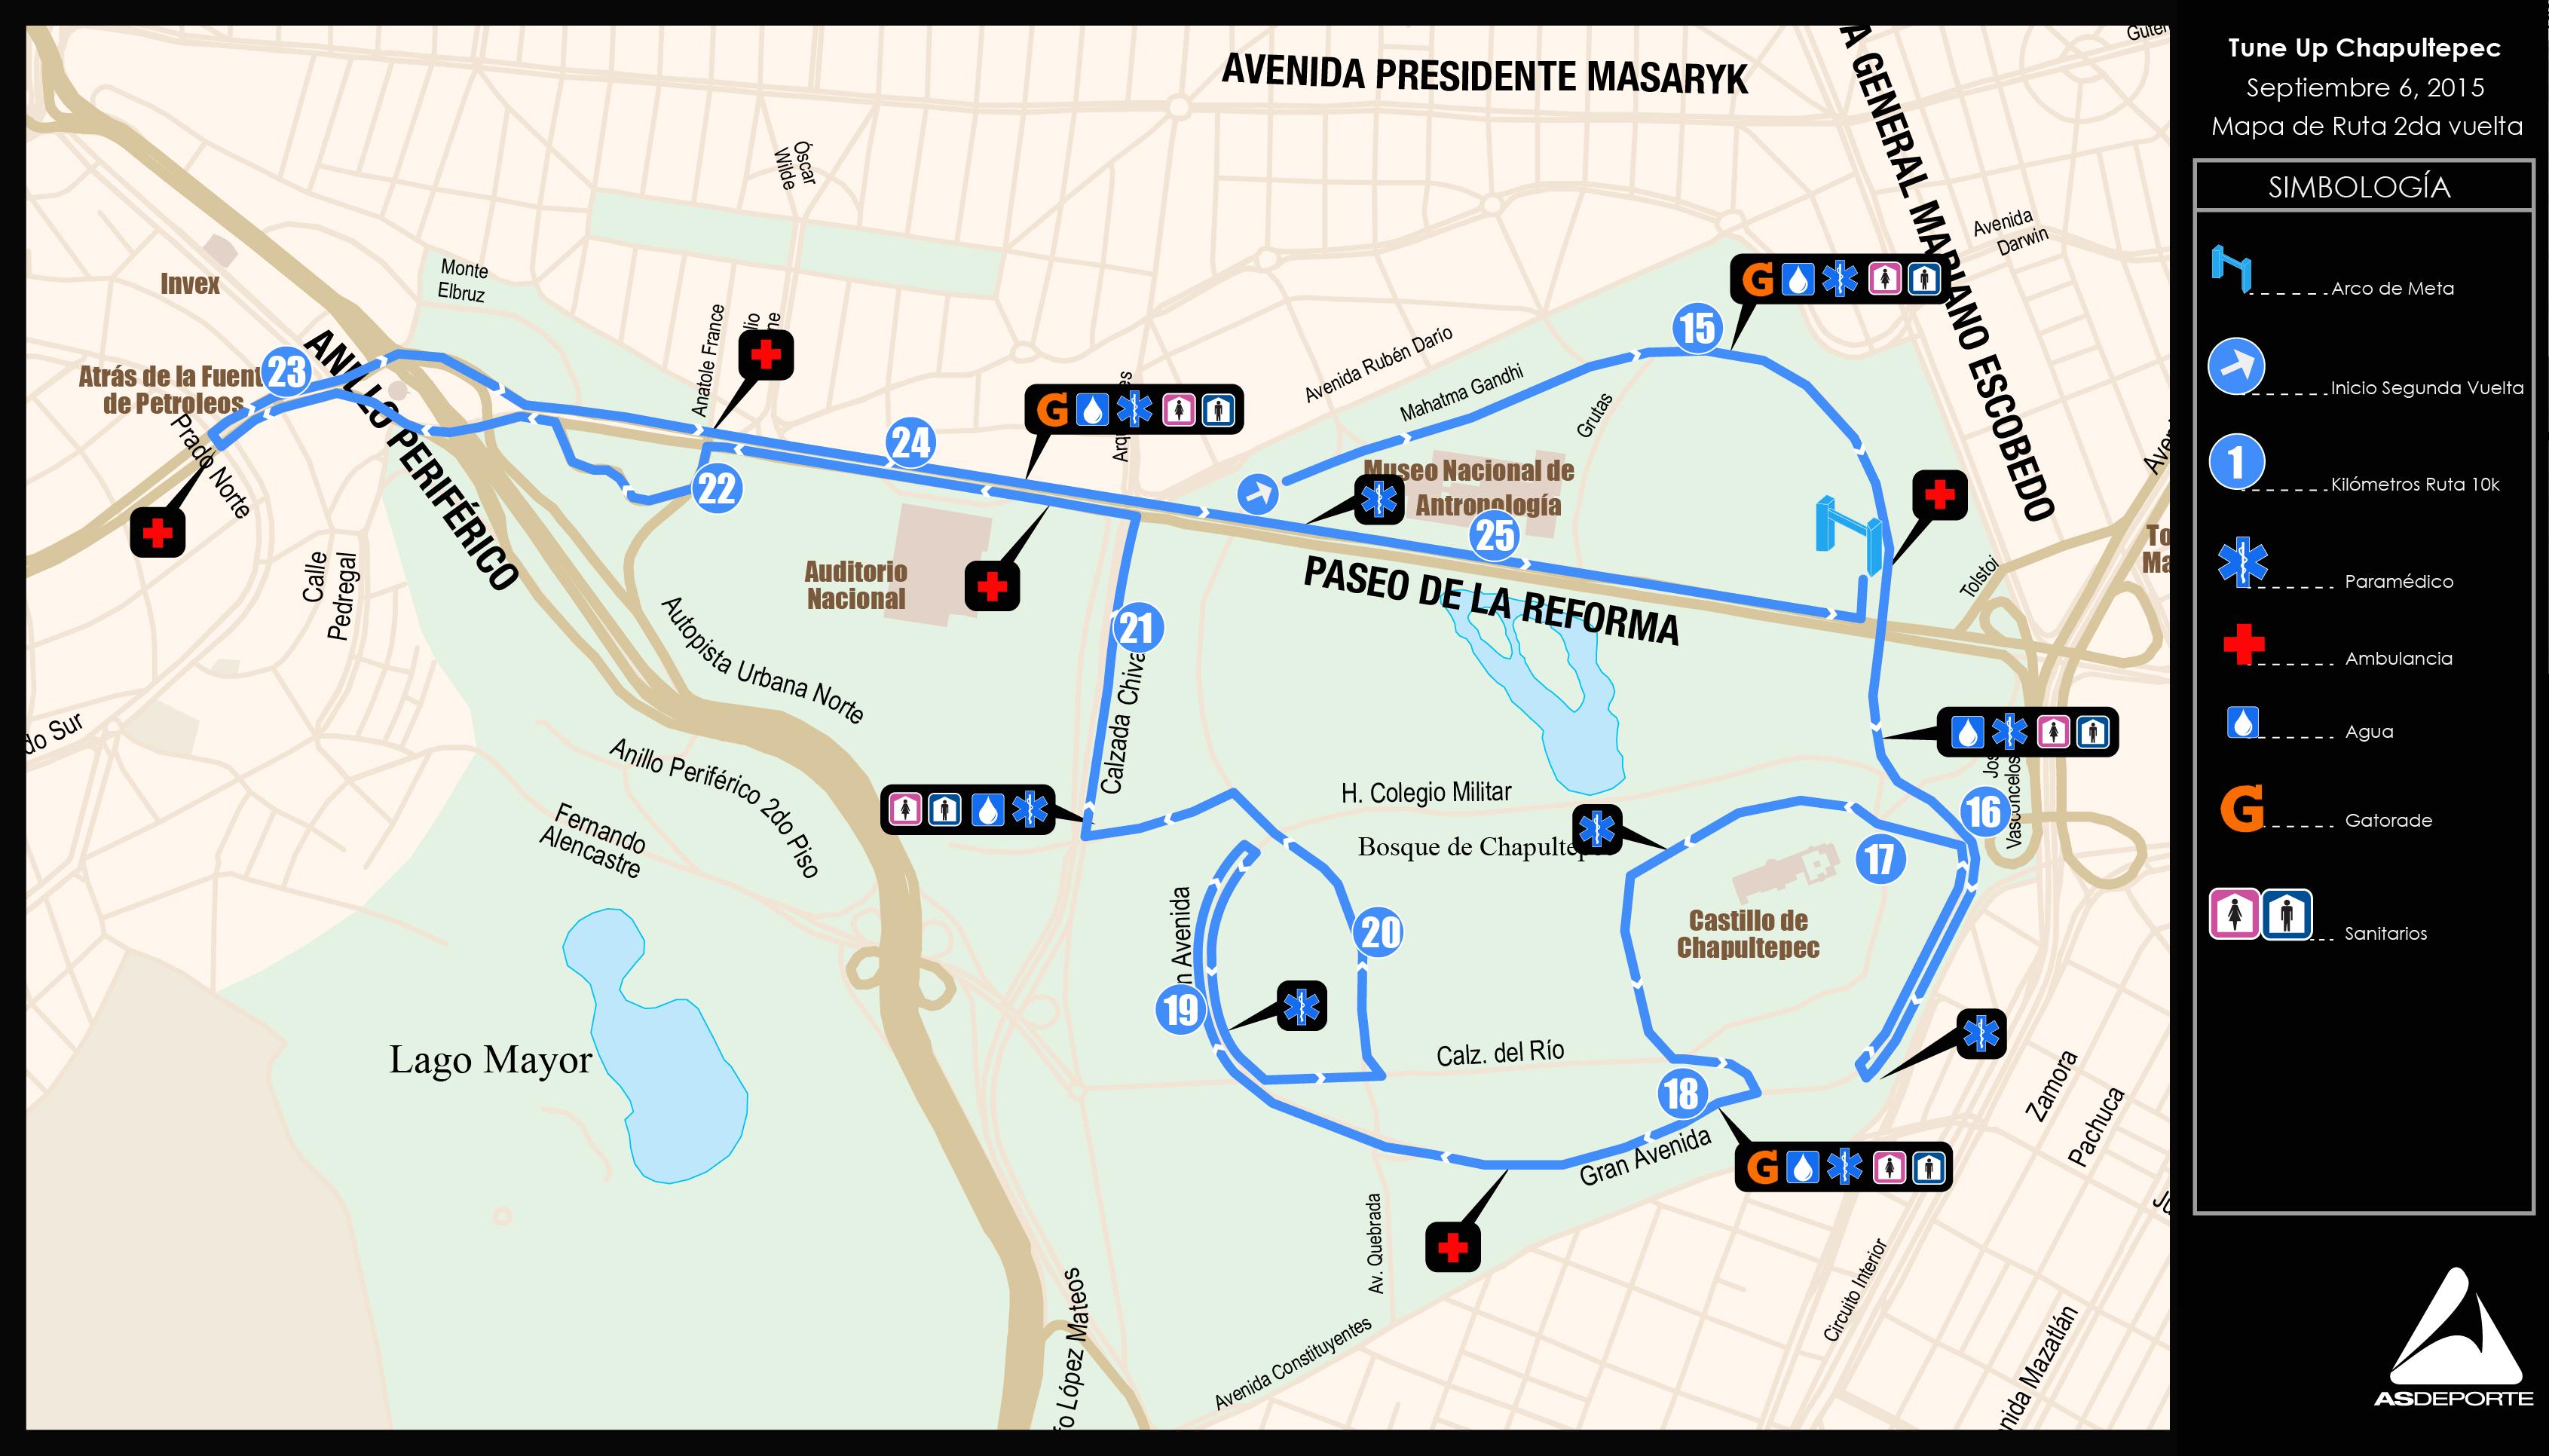 ruta tuneup chapultepec 15K 26K asdeporte